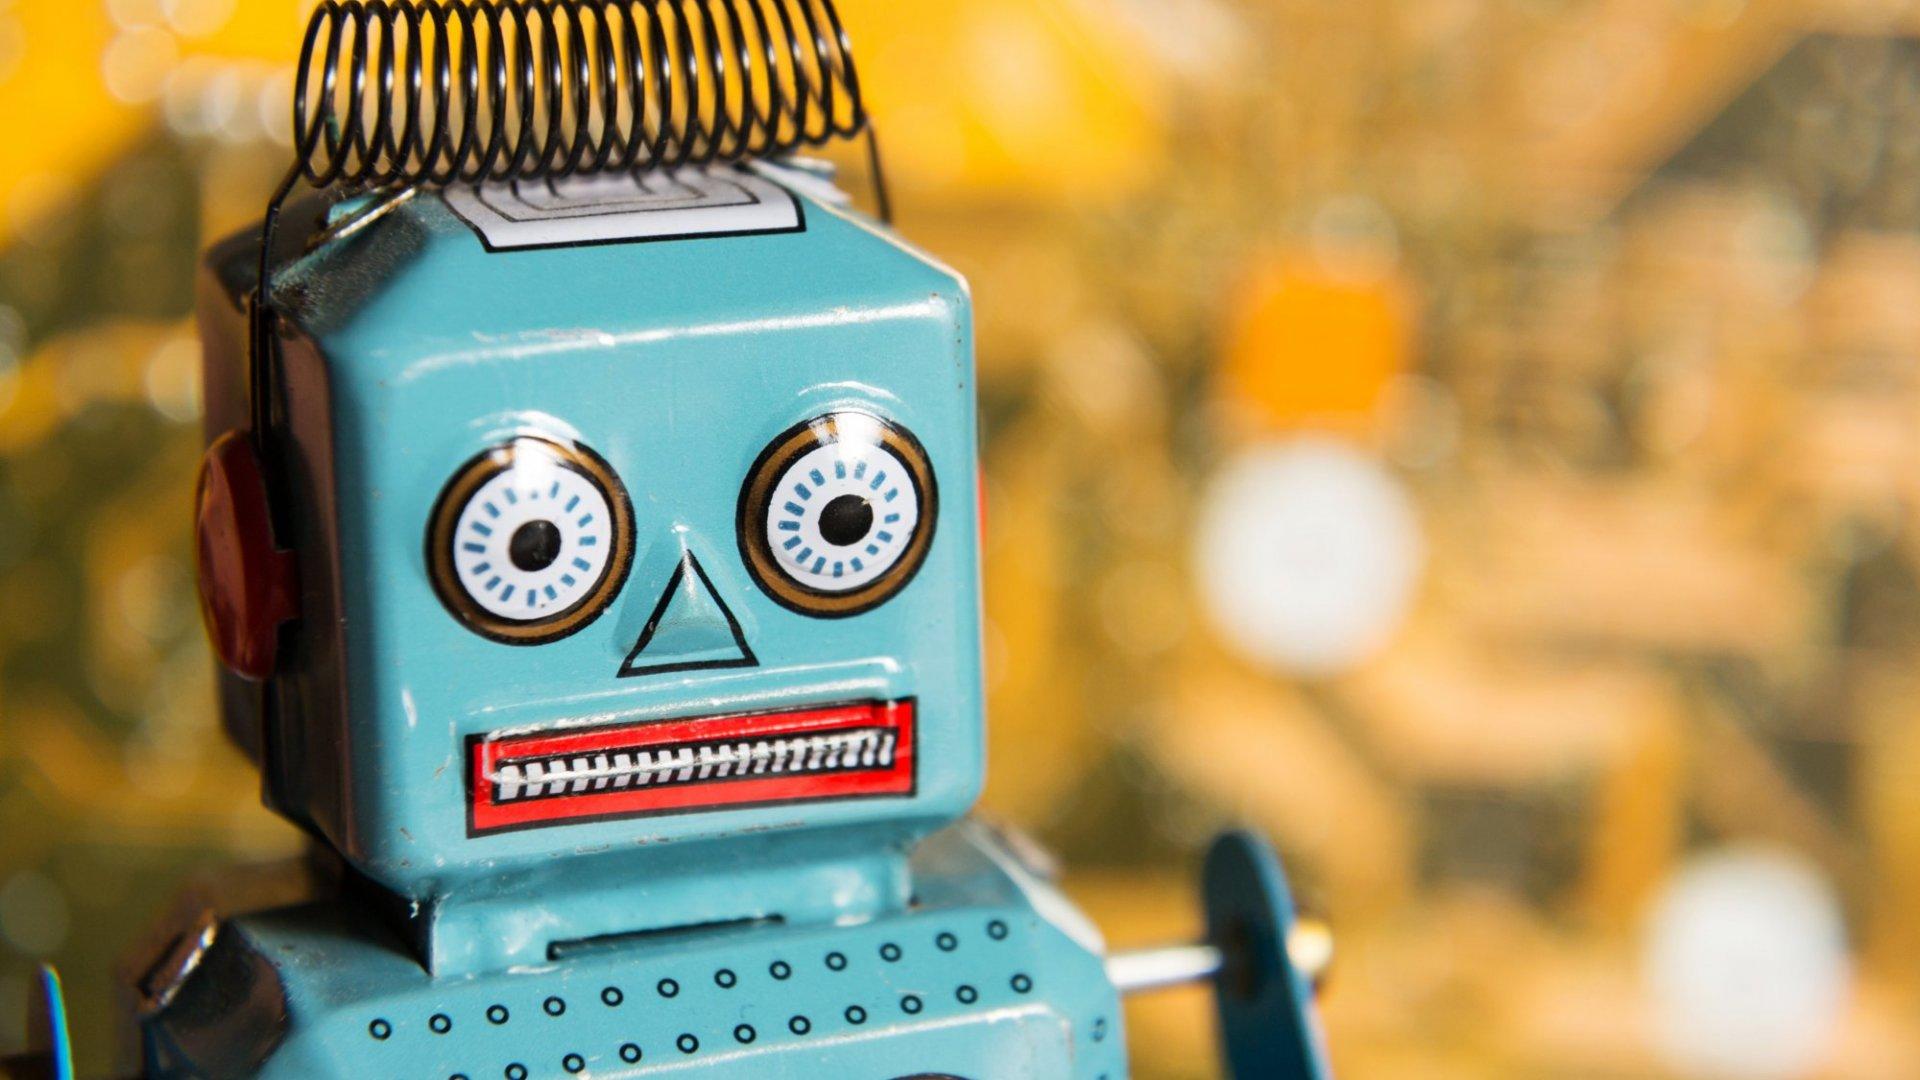 No, Google's Quantum Breakthrough Probably Won't Trigger a Robot Apocalypse.